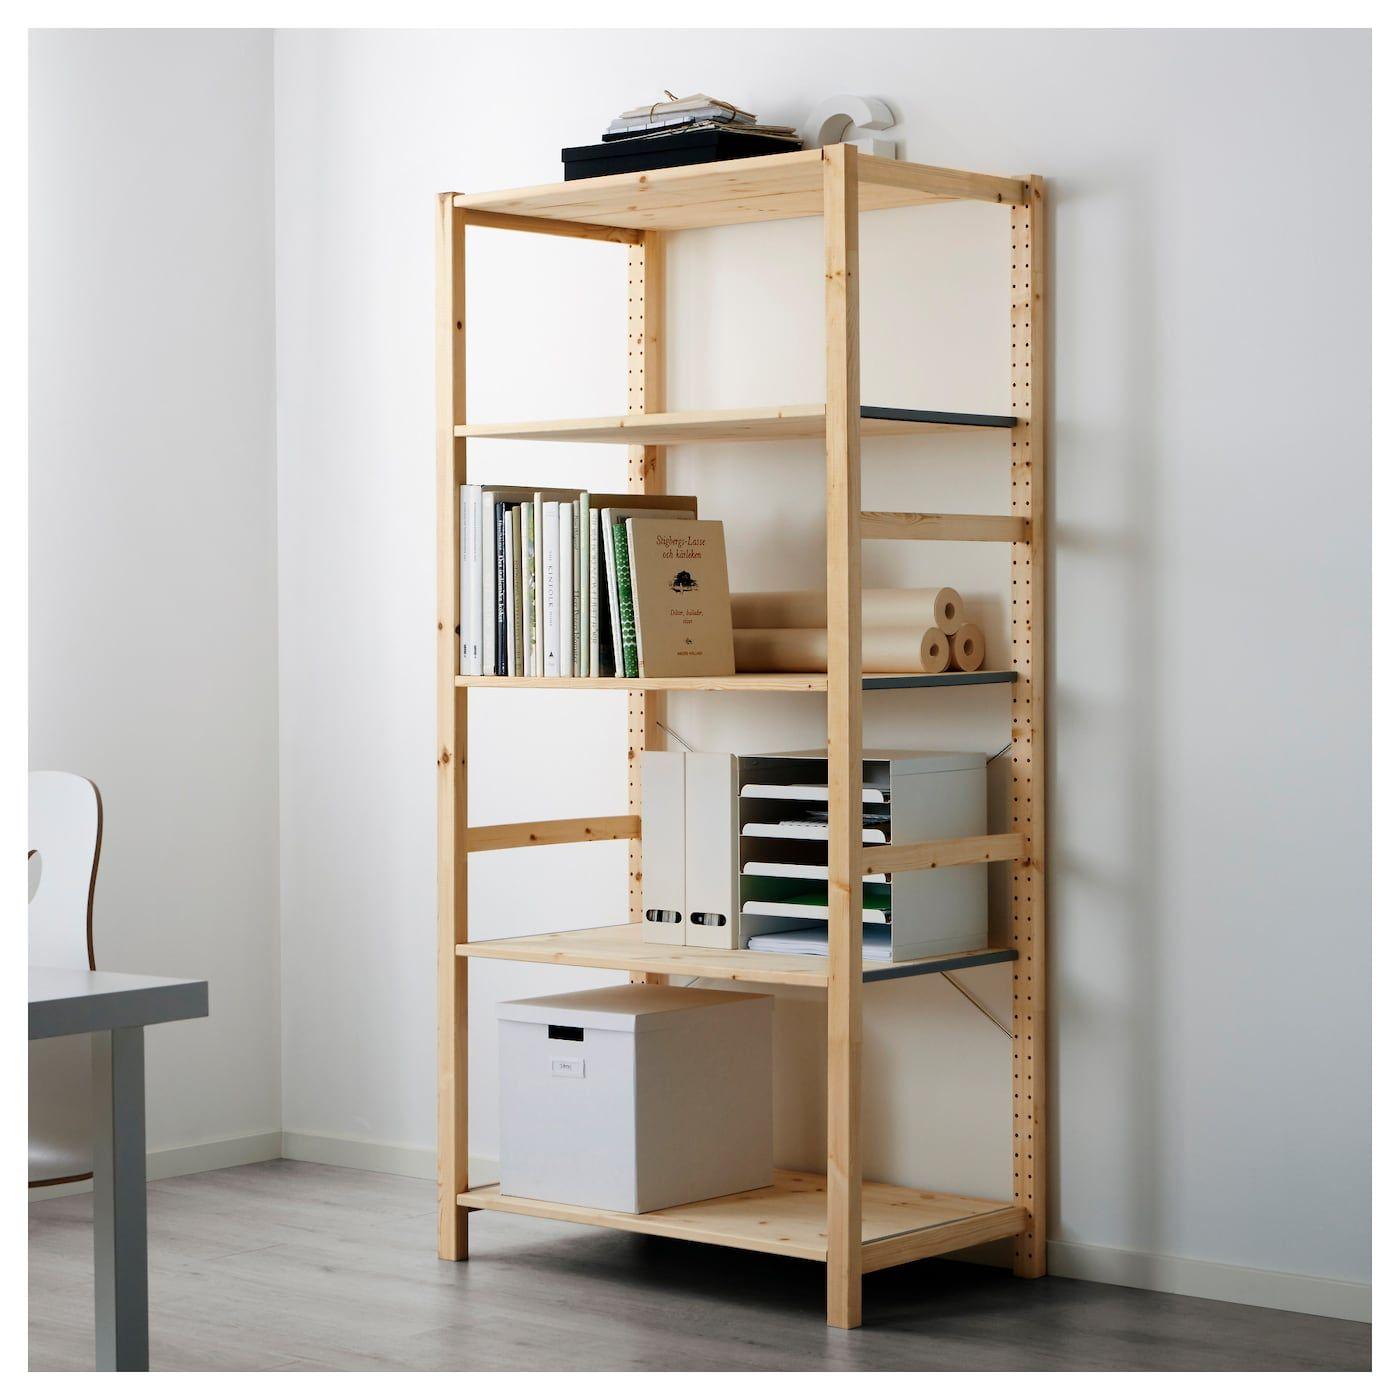 Us Furniture And Home Furnishings With Images Ikea Shelving Unit Ikea Ivar Shelving Unit